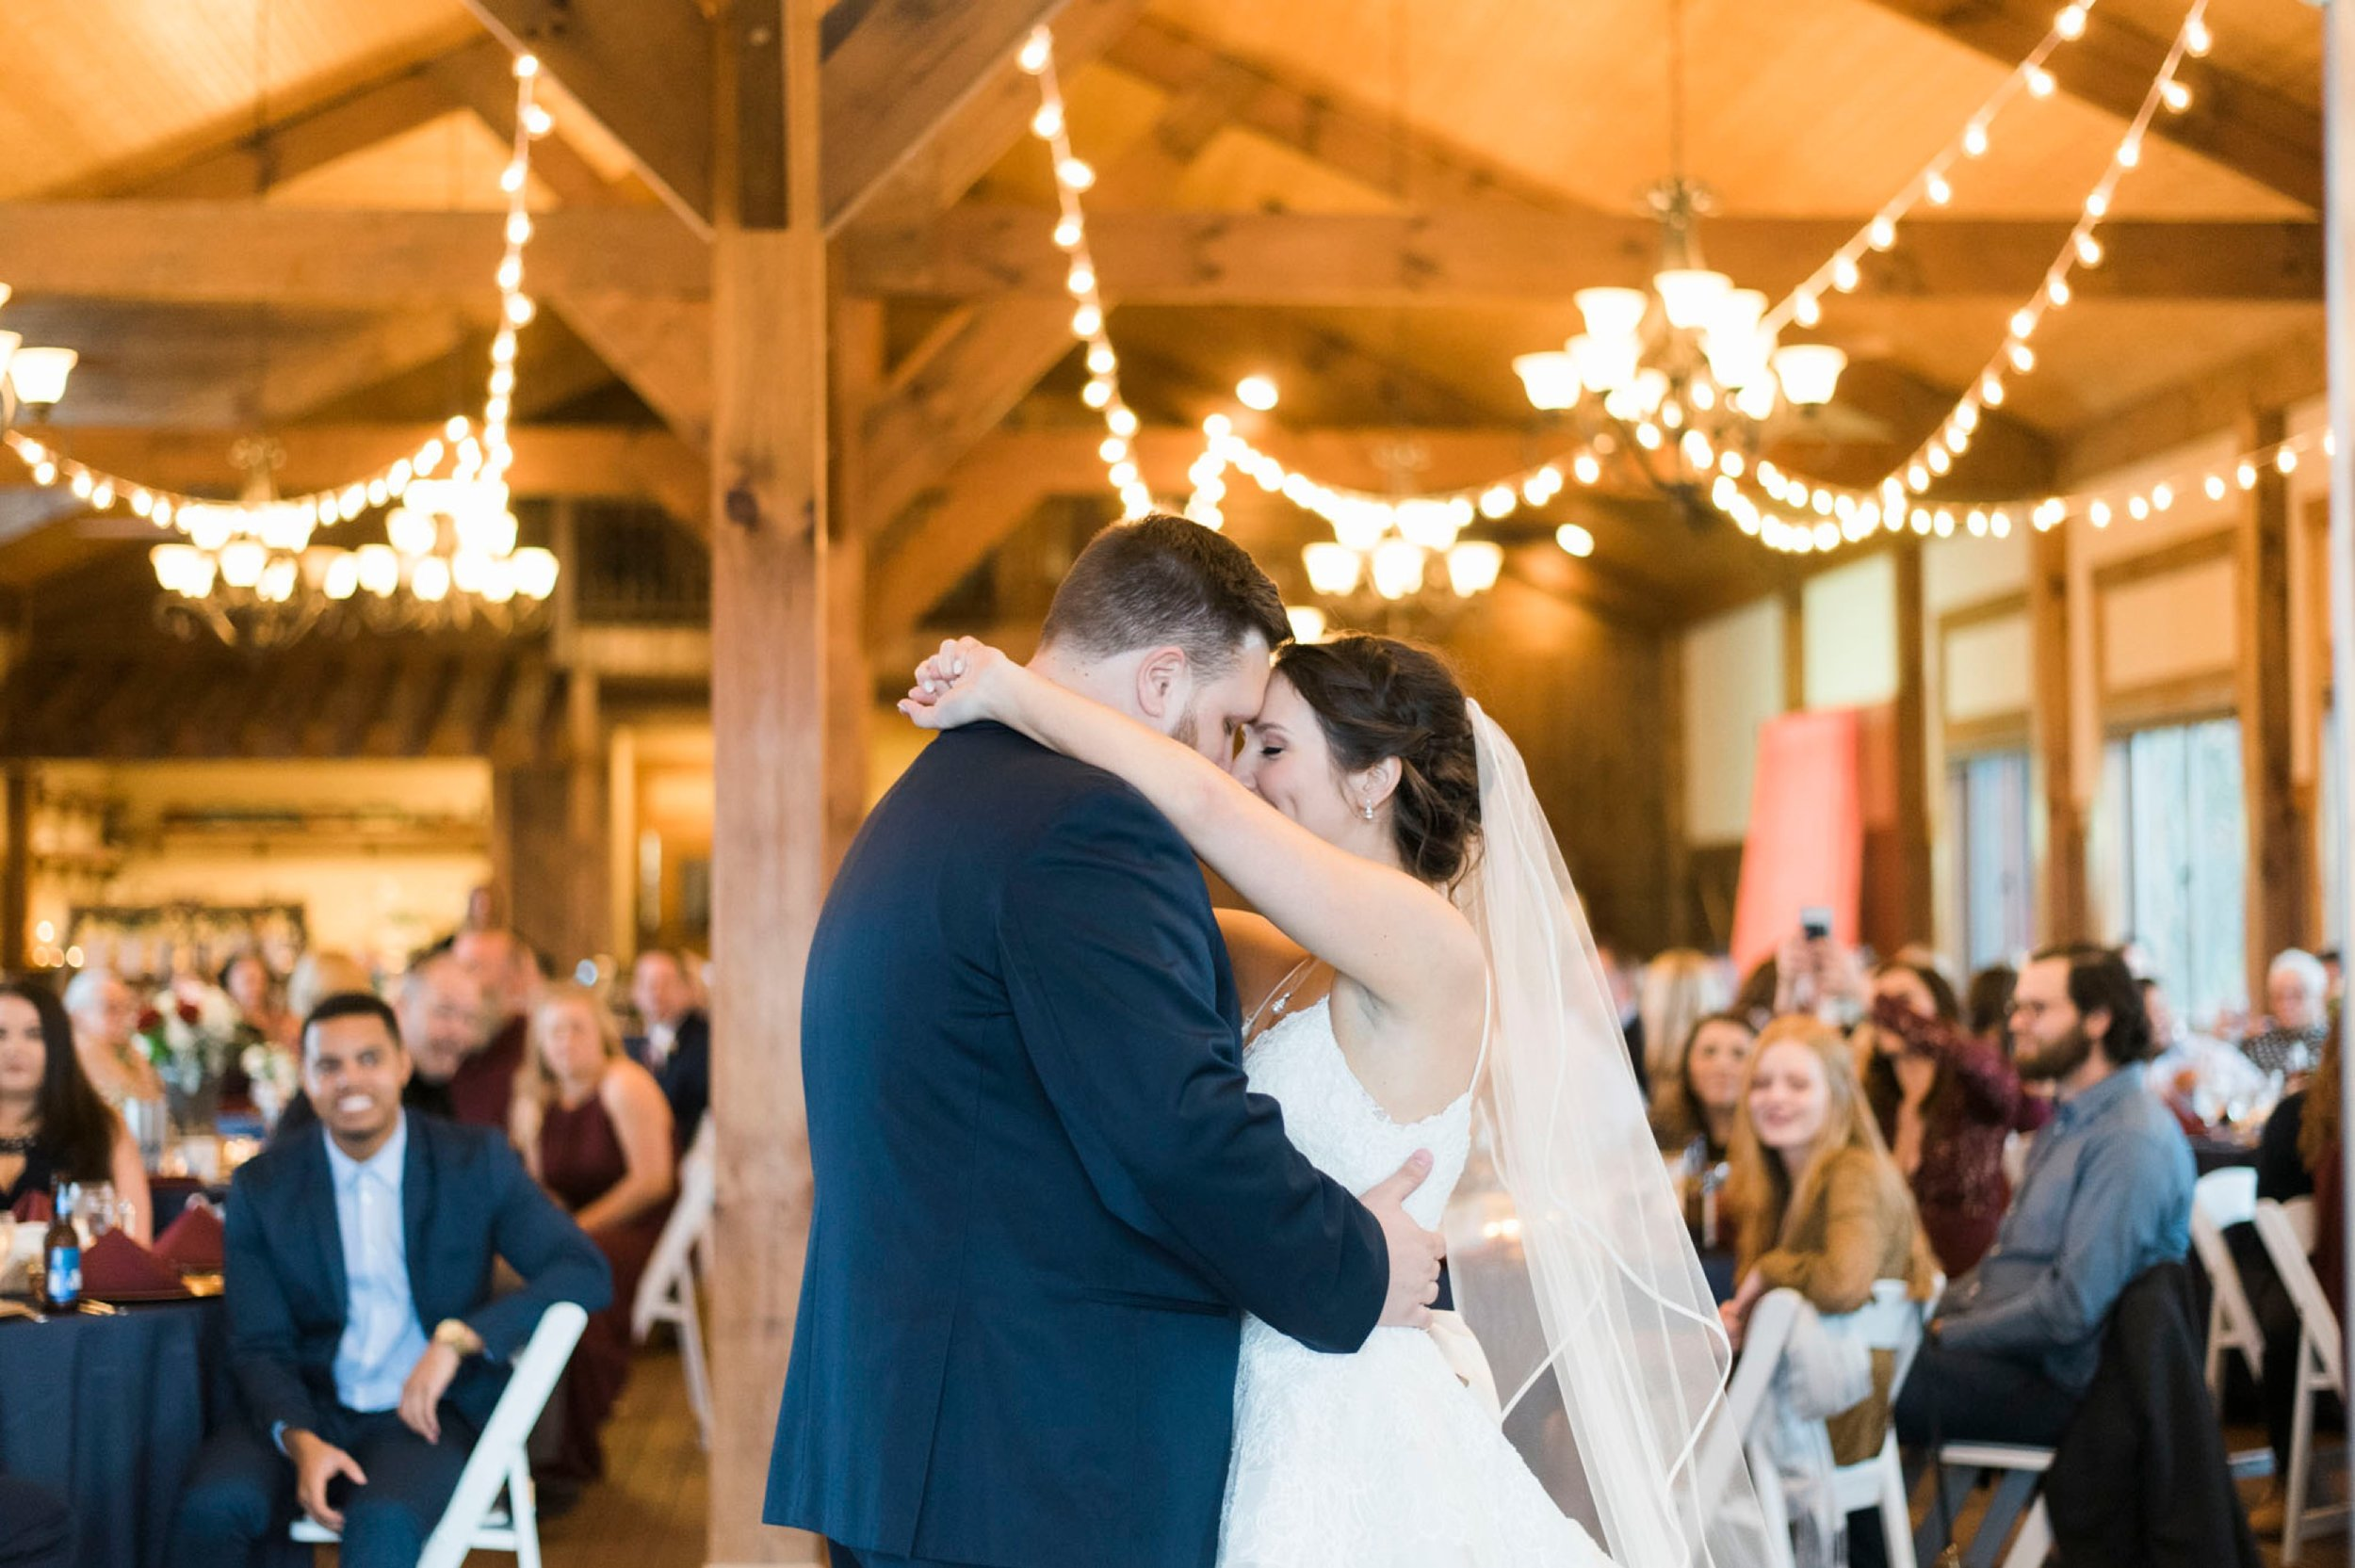 IrvineEstate_LexingtonVA_Wedding_FallWedding_VirginiaWeddingPhotographer 103.jpg